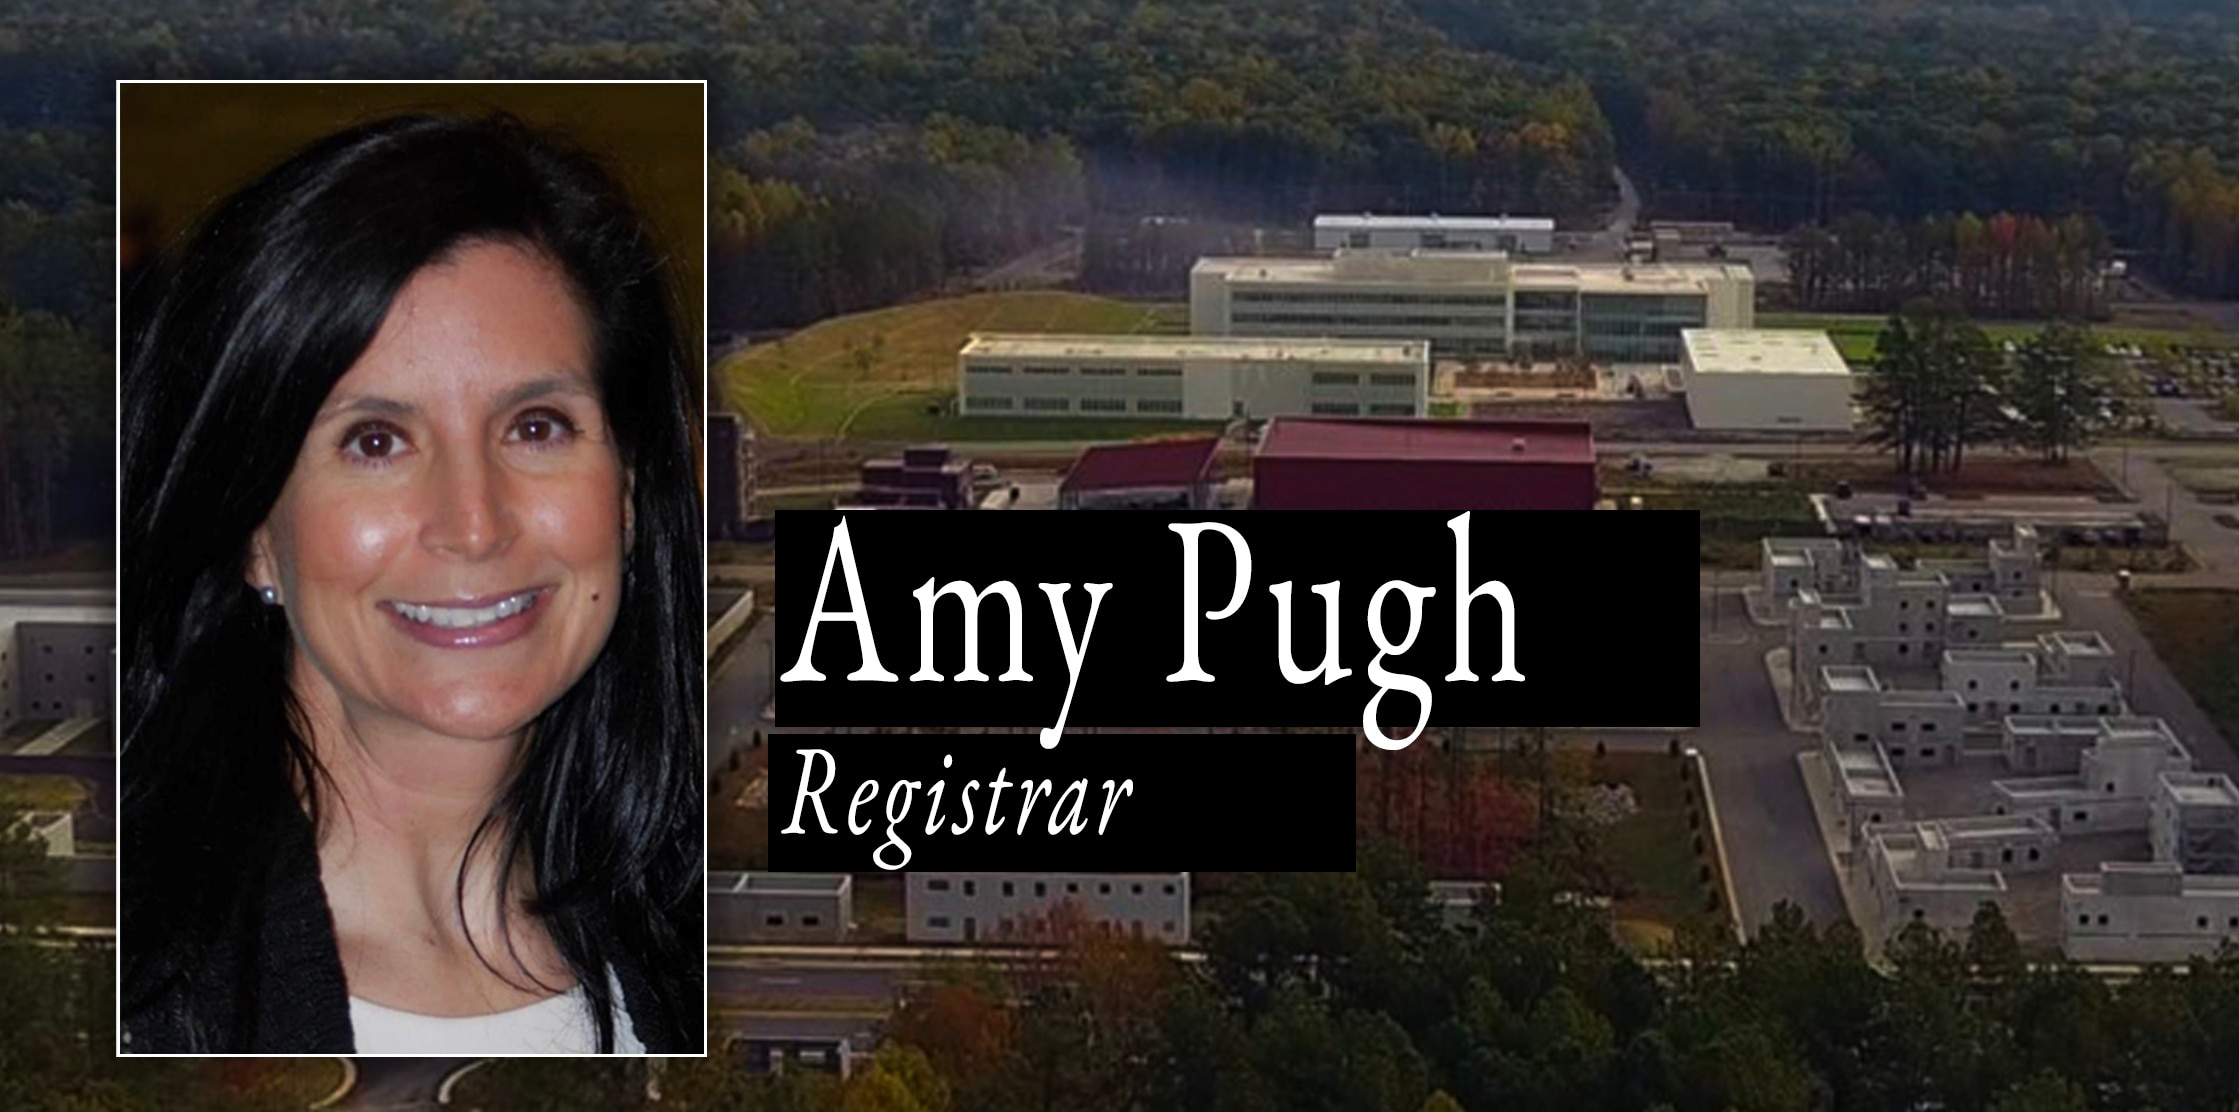 Image of Amy Pugh